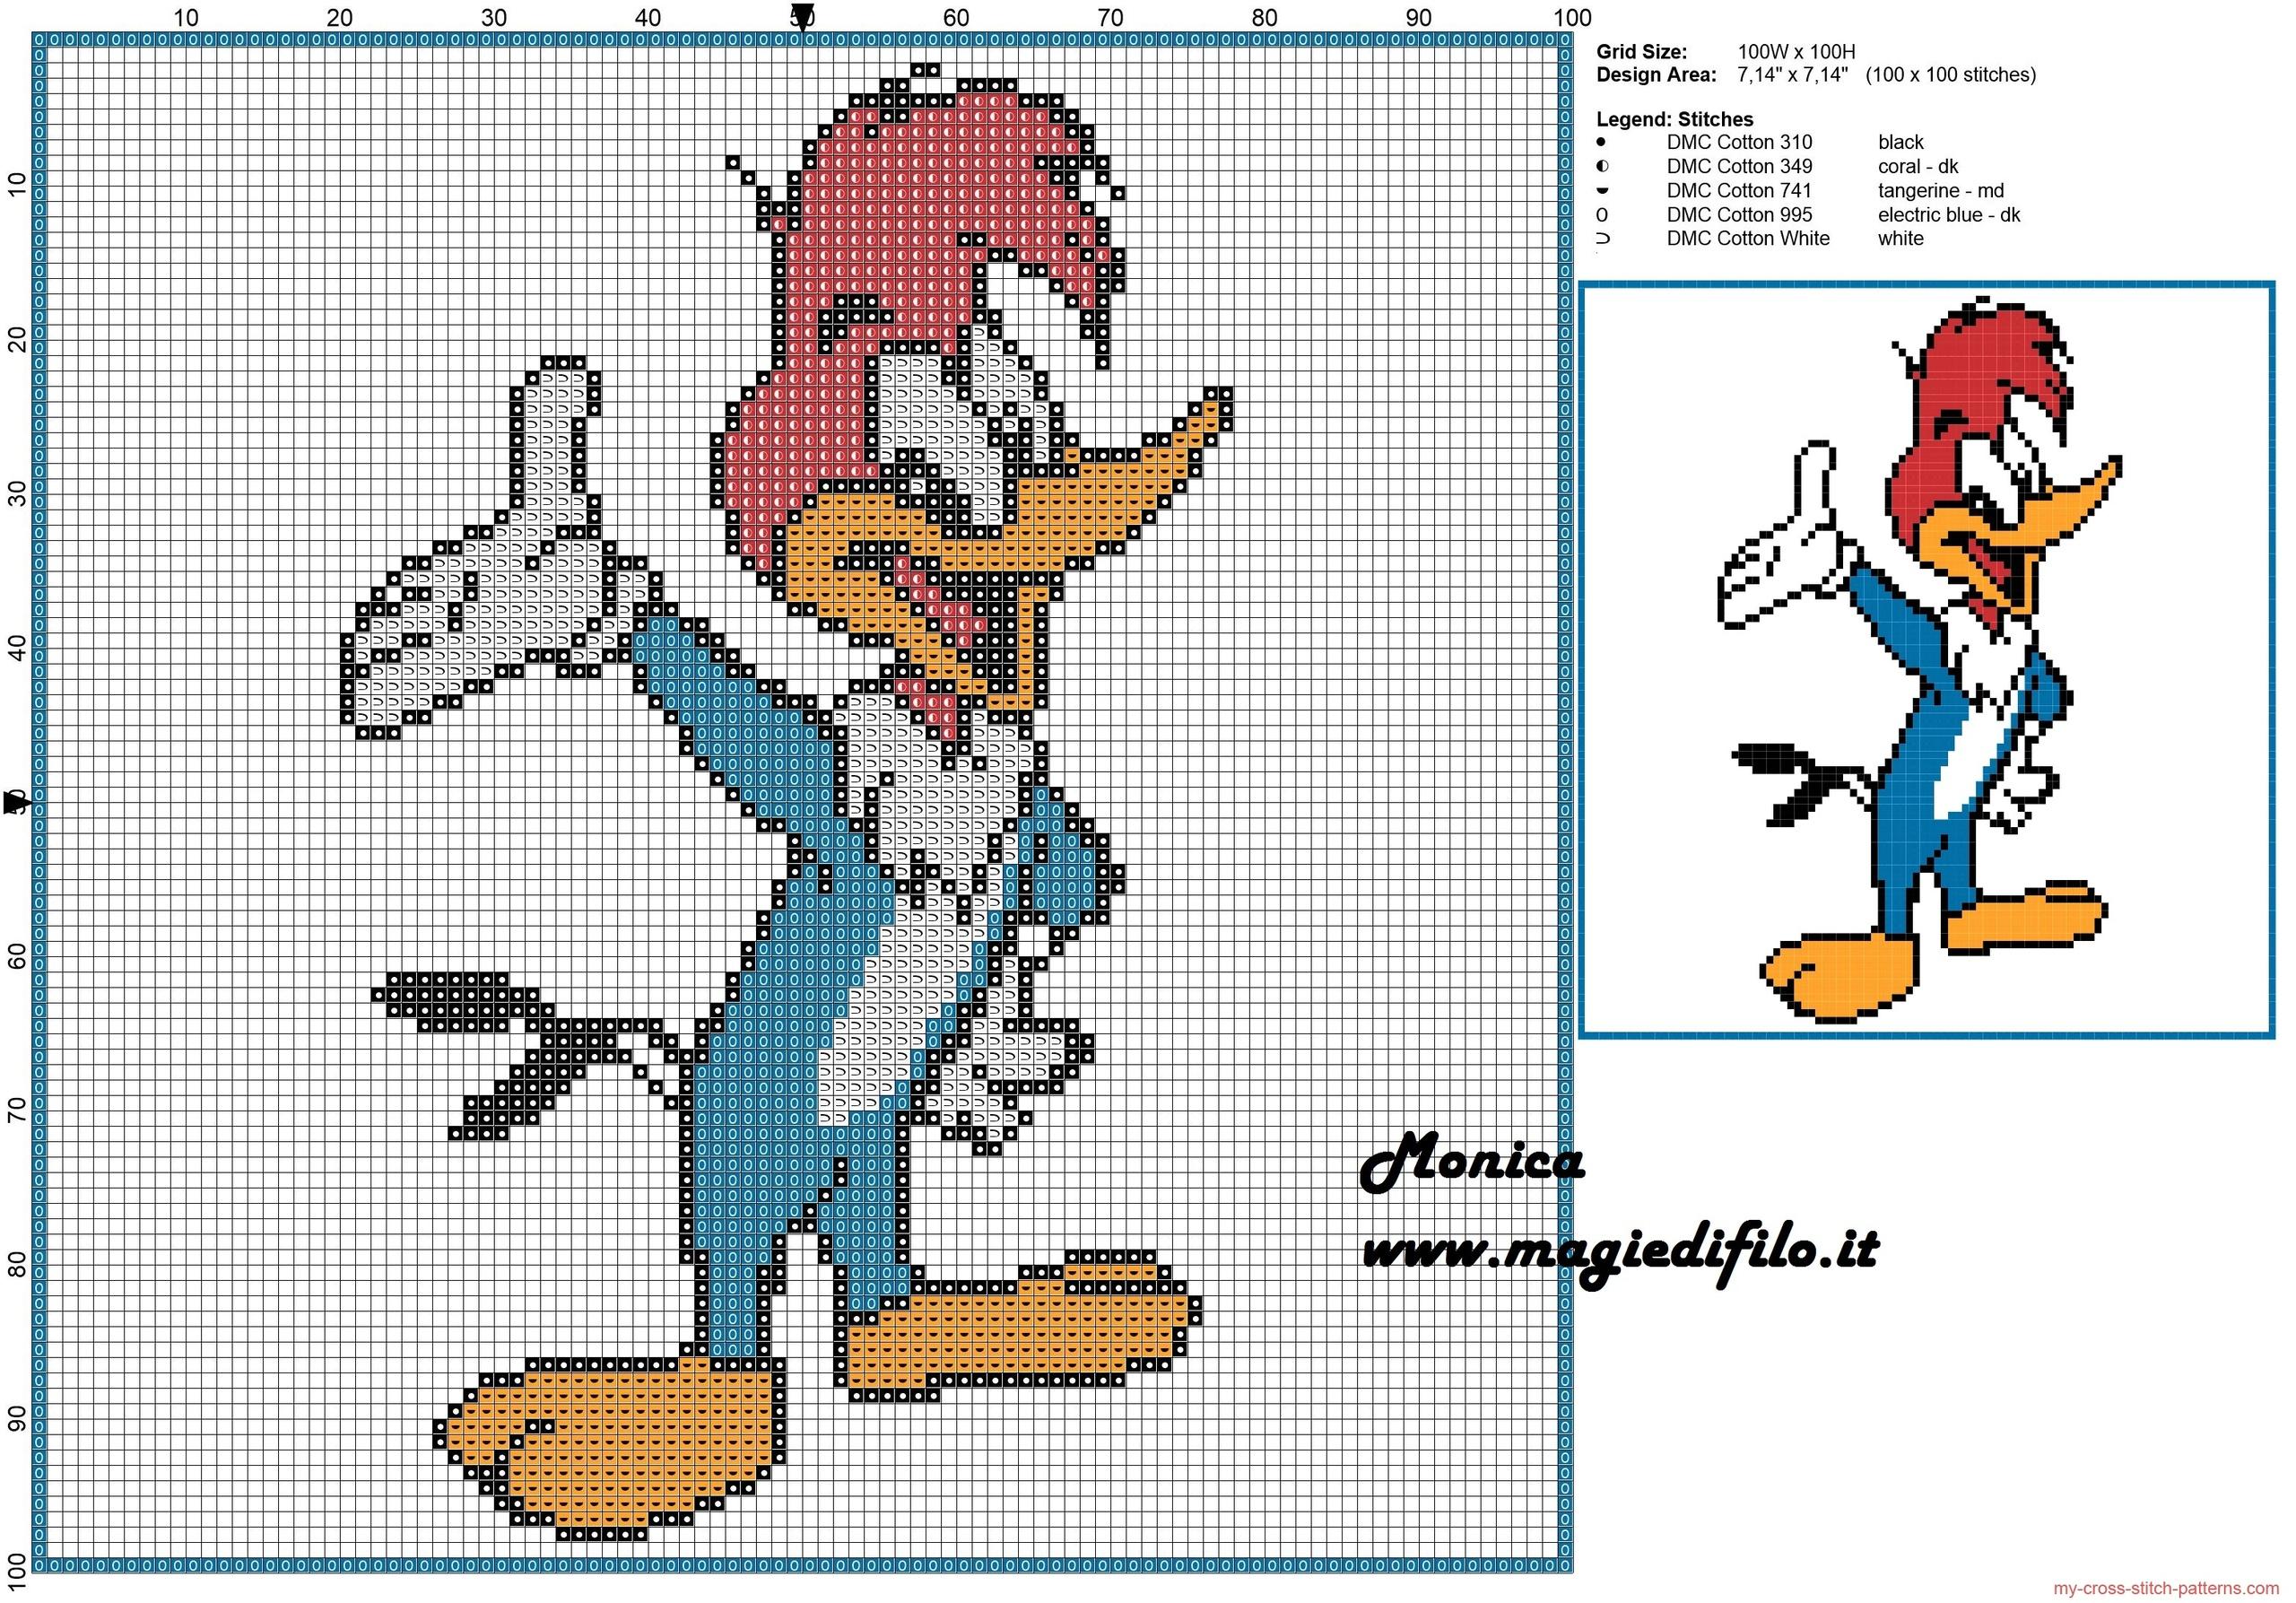 woody_woodpecker_cross_stitch_pattern_